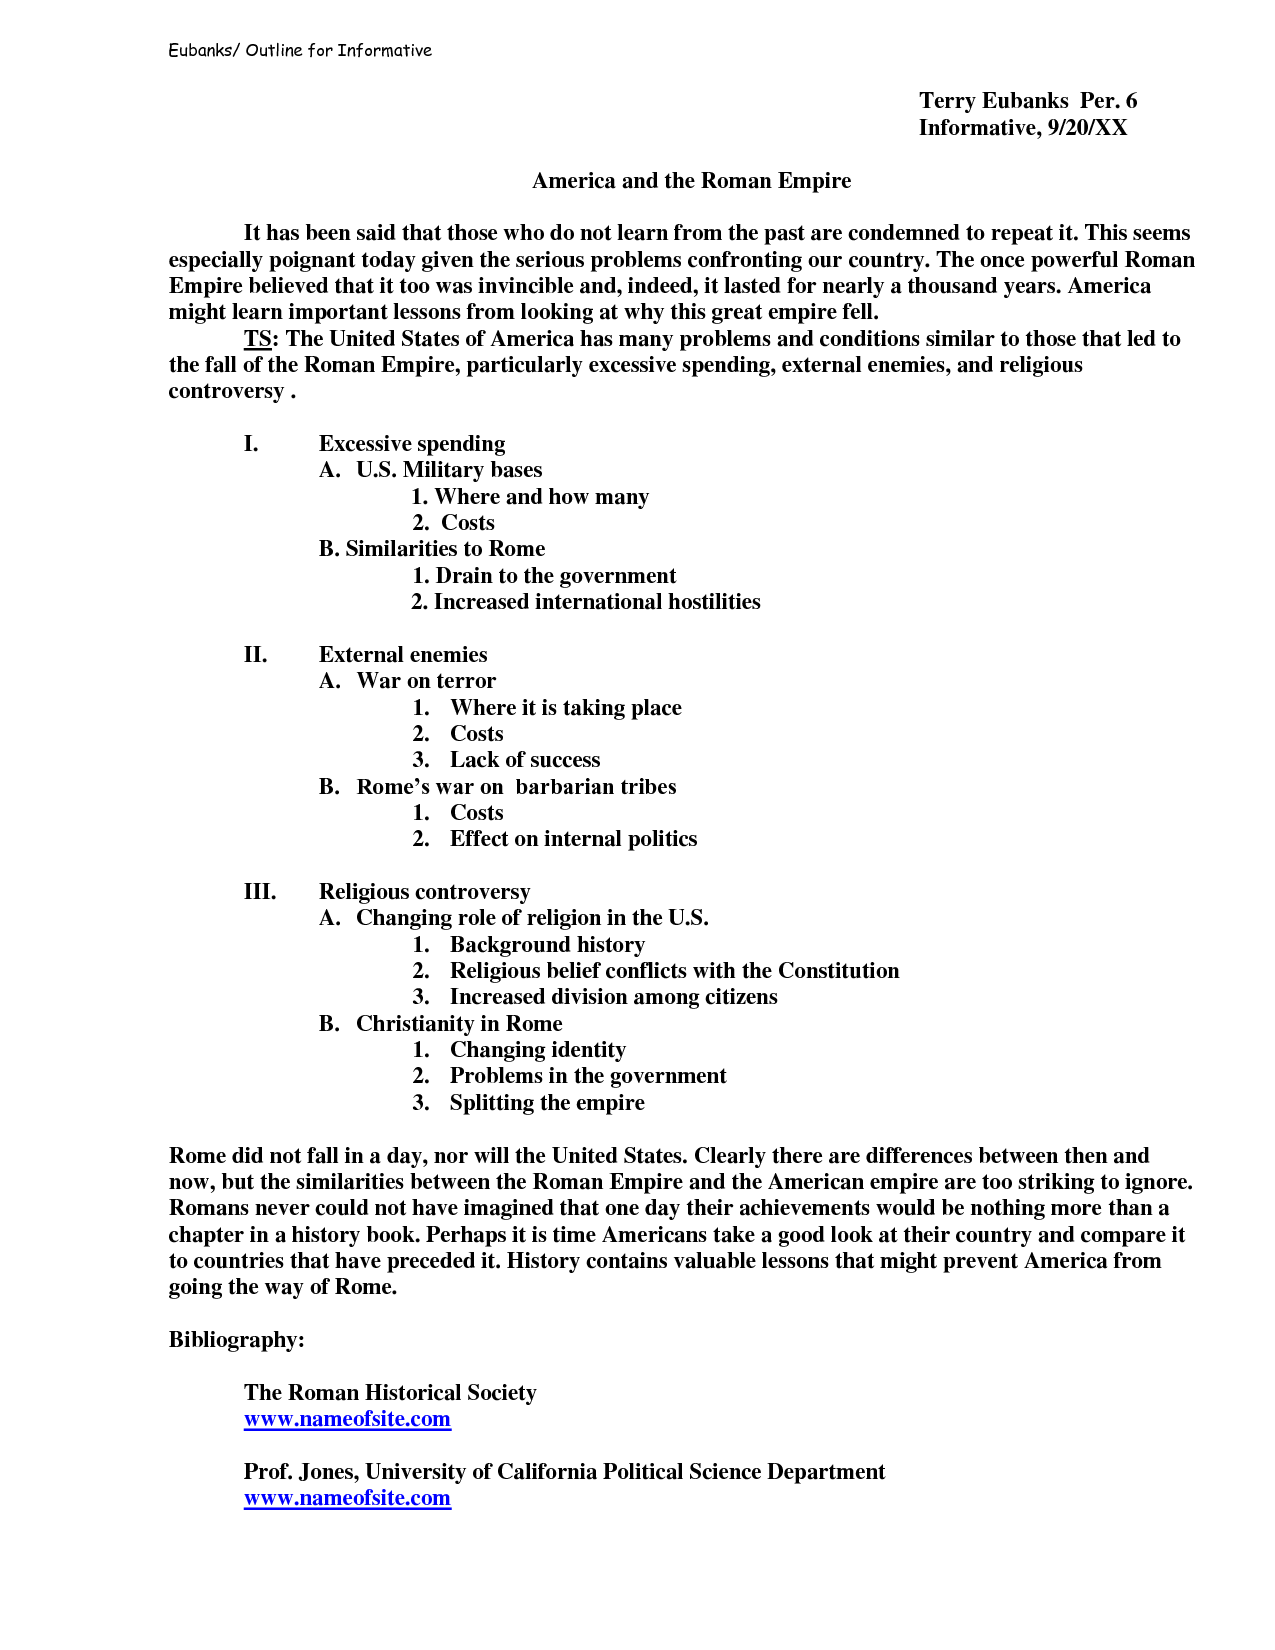 Dissertation analysis section